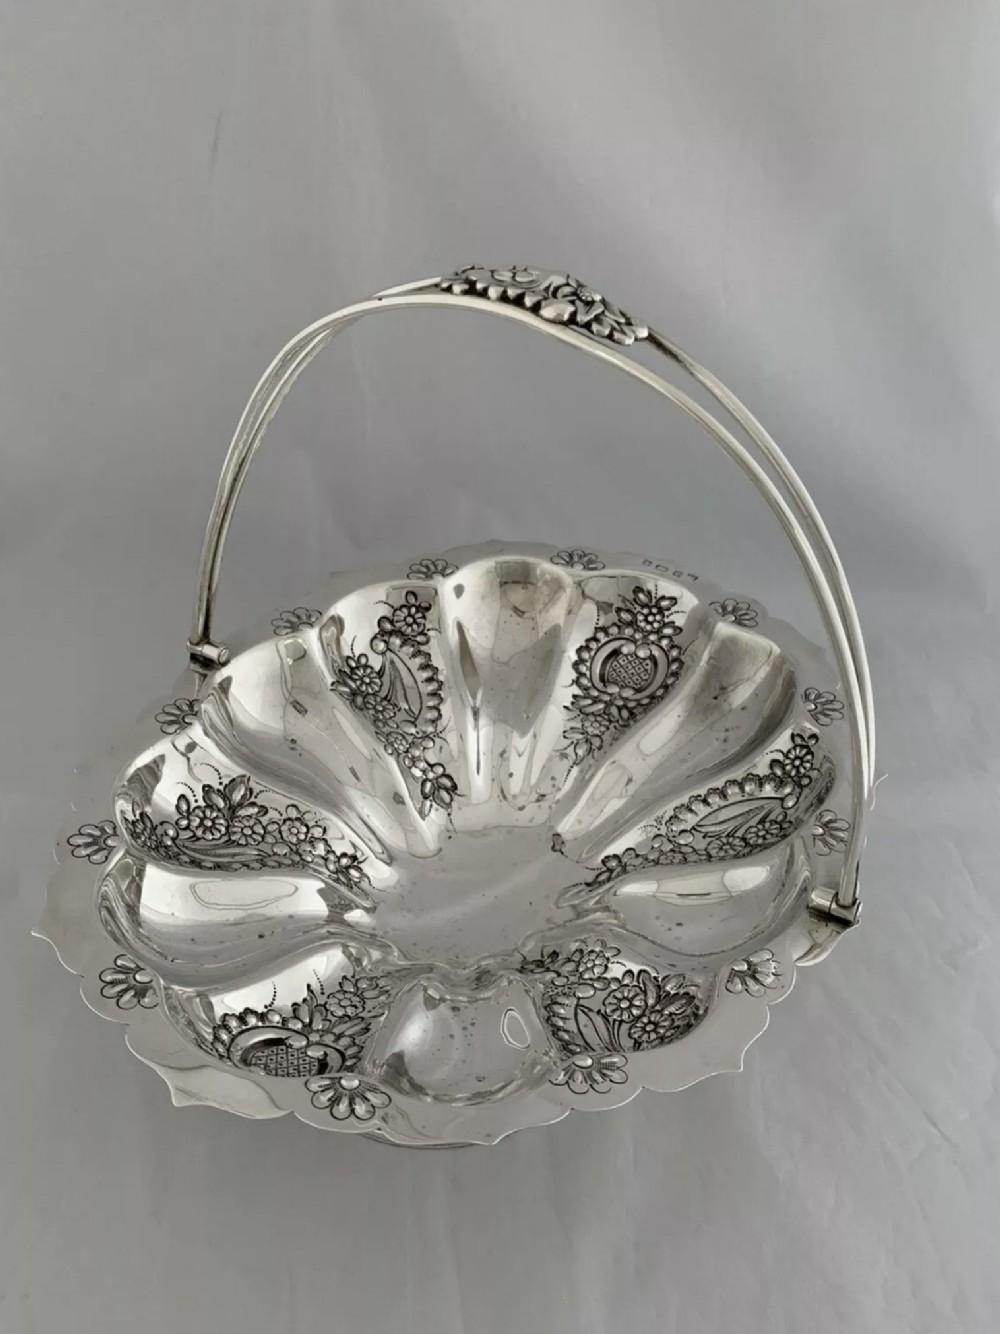 edwardian antique silver swing handle fruit bowl or basket 1905 birmingham